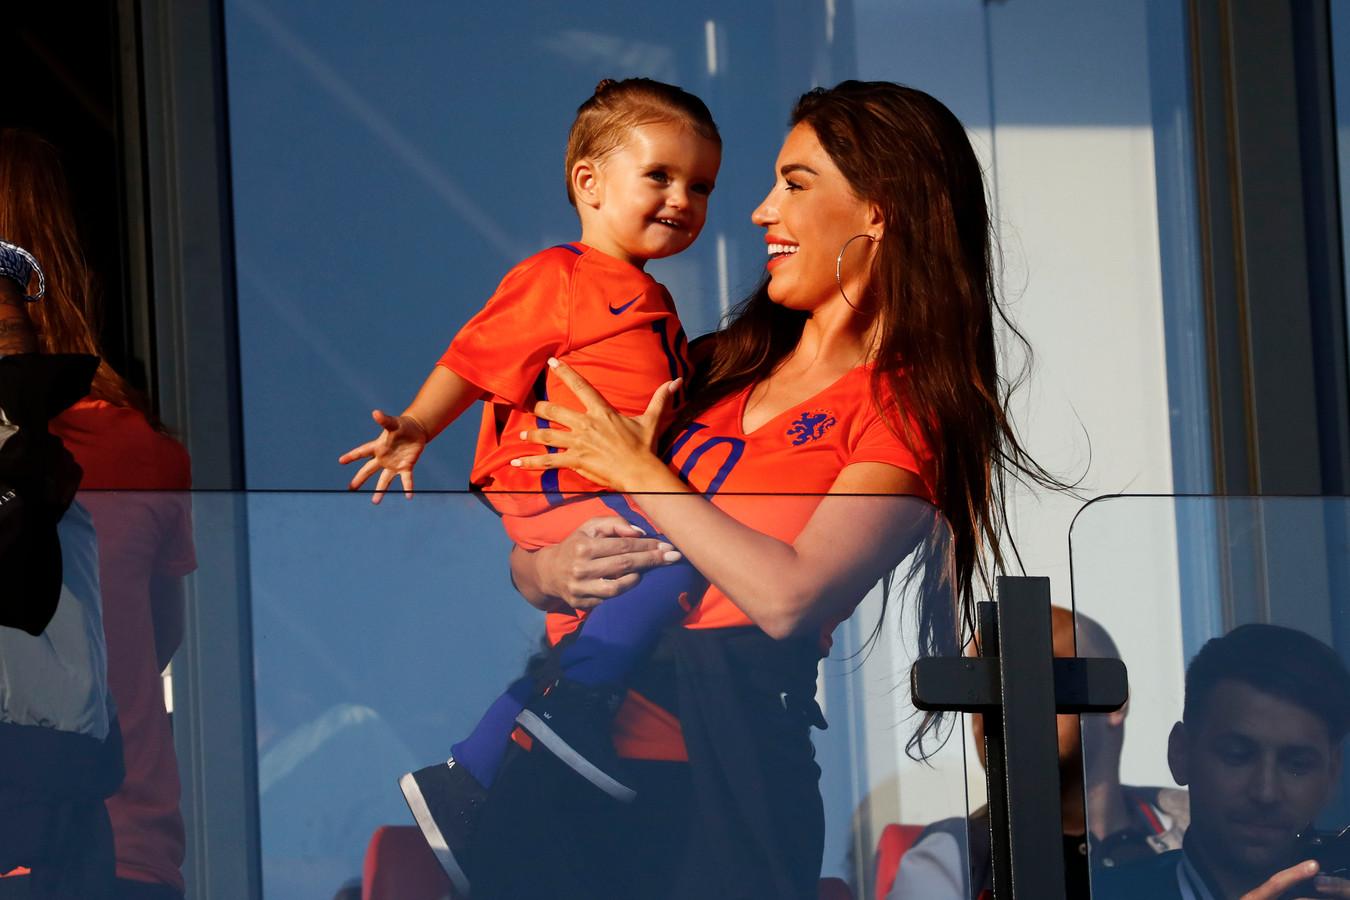 Yolanthe Sneijder-Cabau en haar zoontje Xess Xava Sneijder.